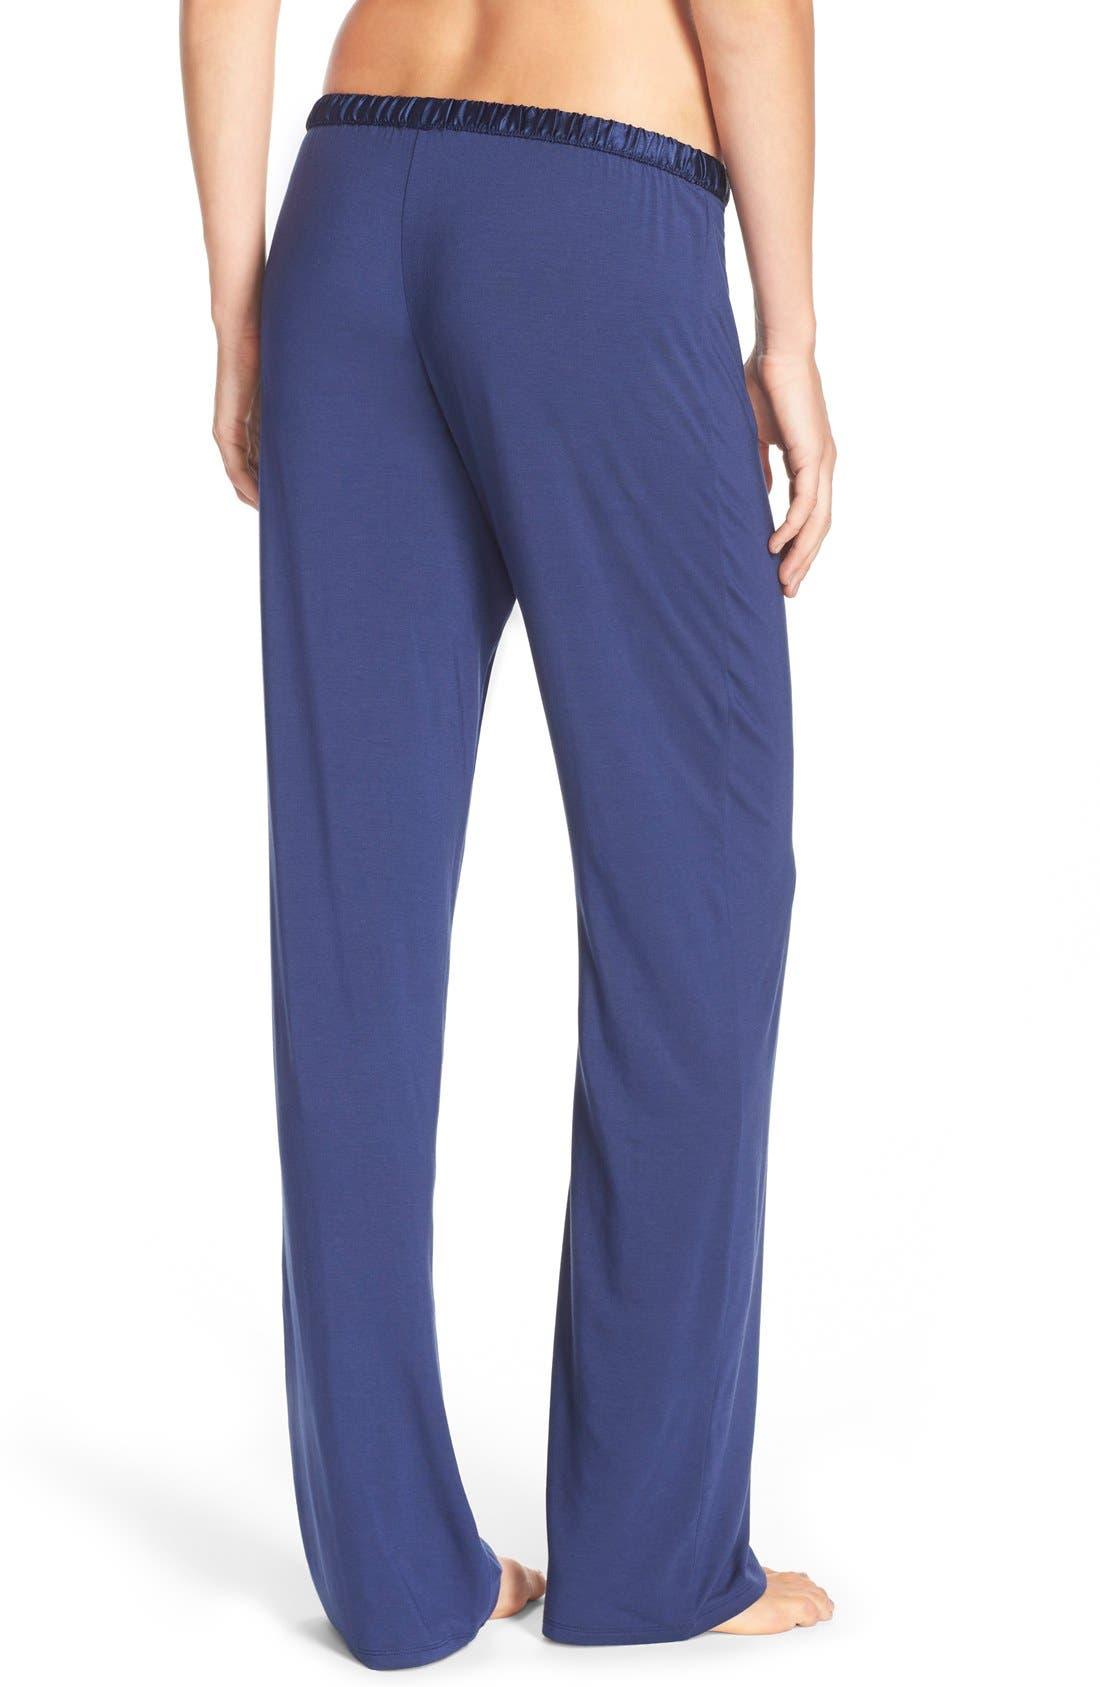 Alternate Image 2  - Calvin Klein 'Essentials' Satin Waist Pajama Pants